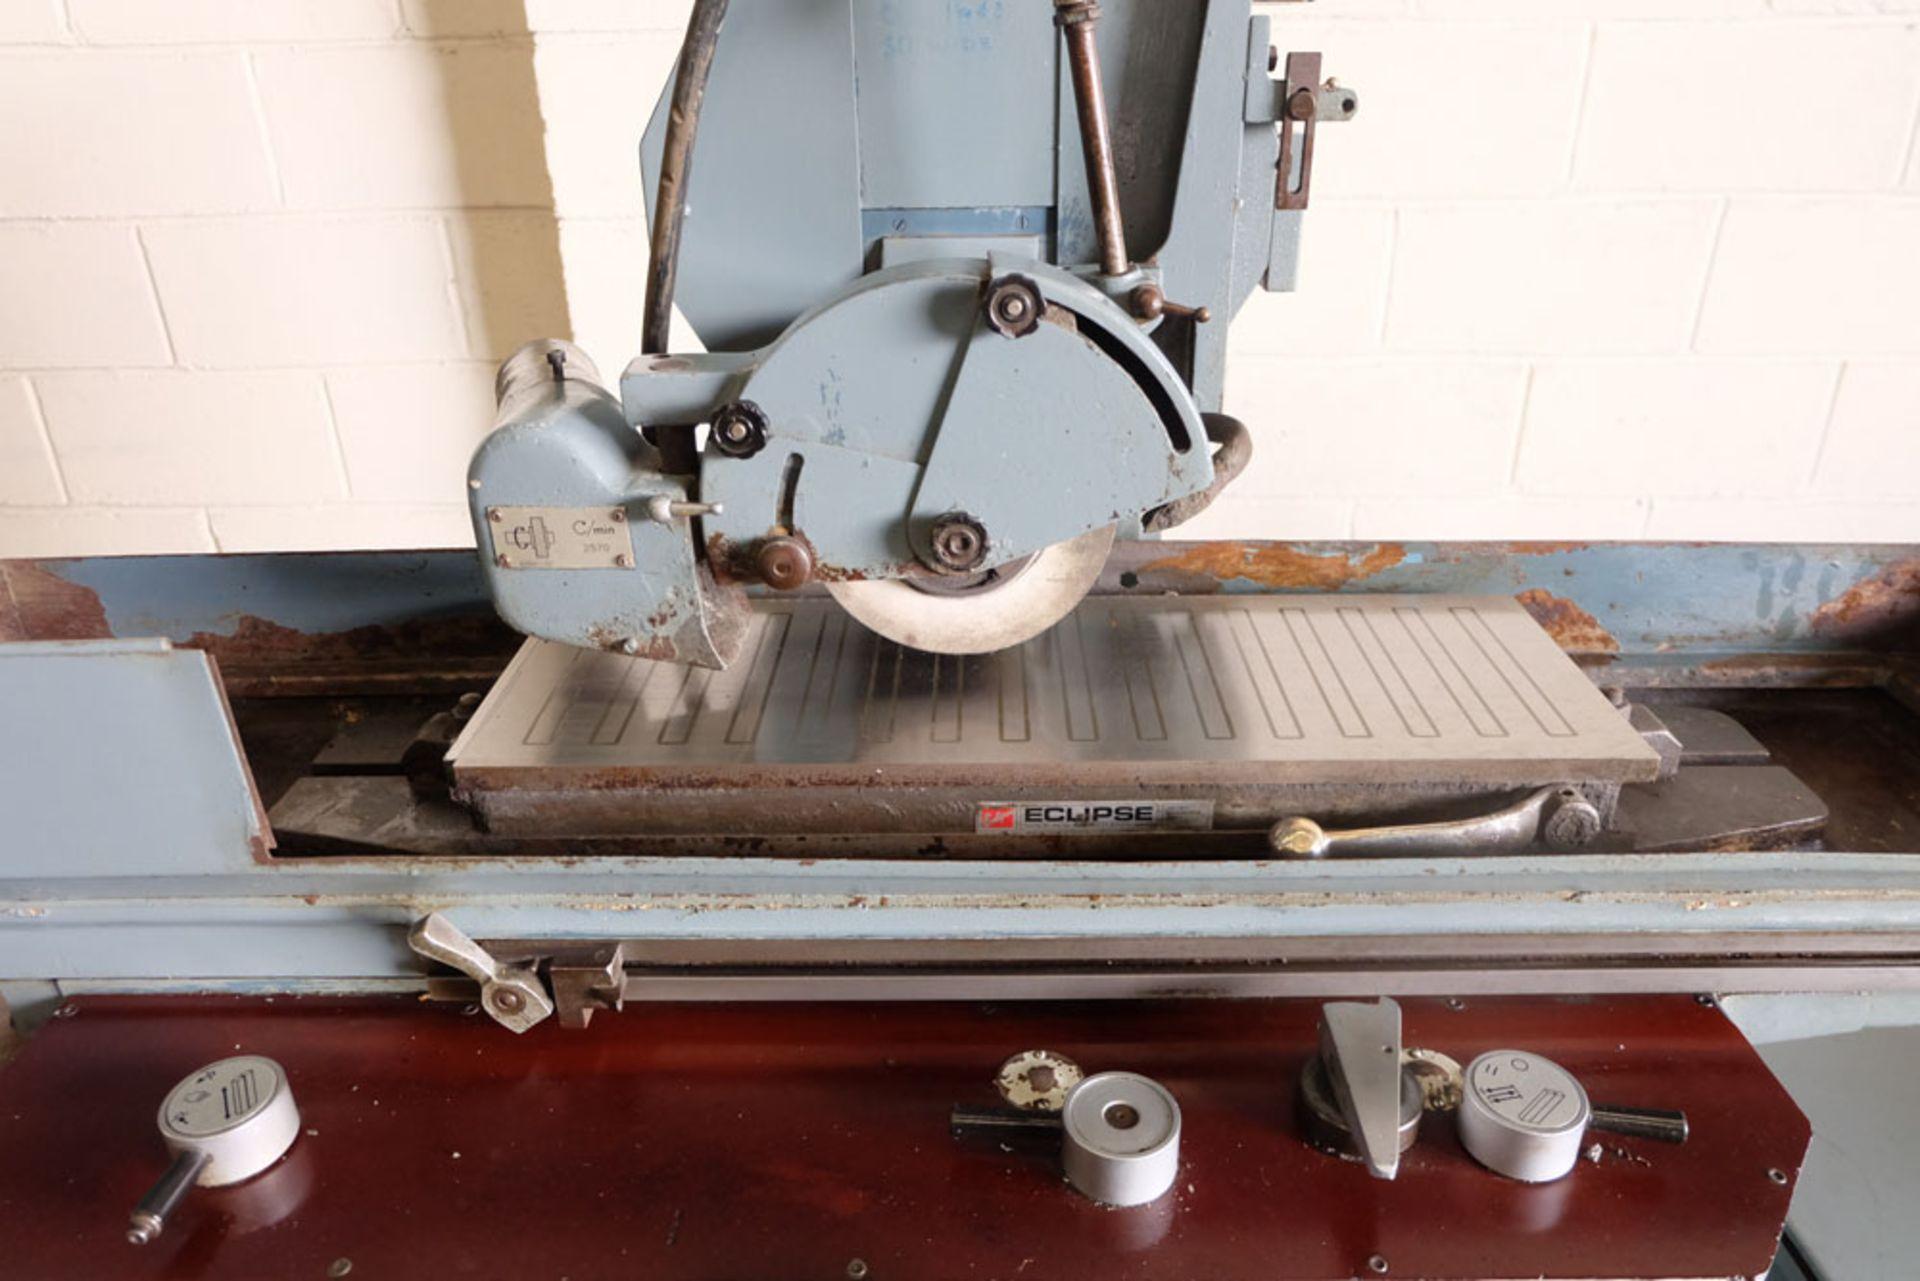 Jones & Shipman 1400P Toolroom Surface Grinder. - Image 2 of 13